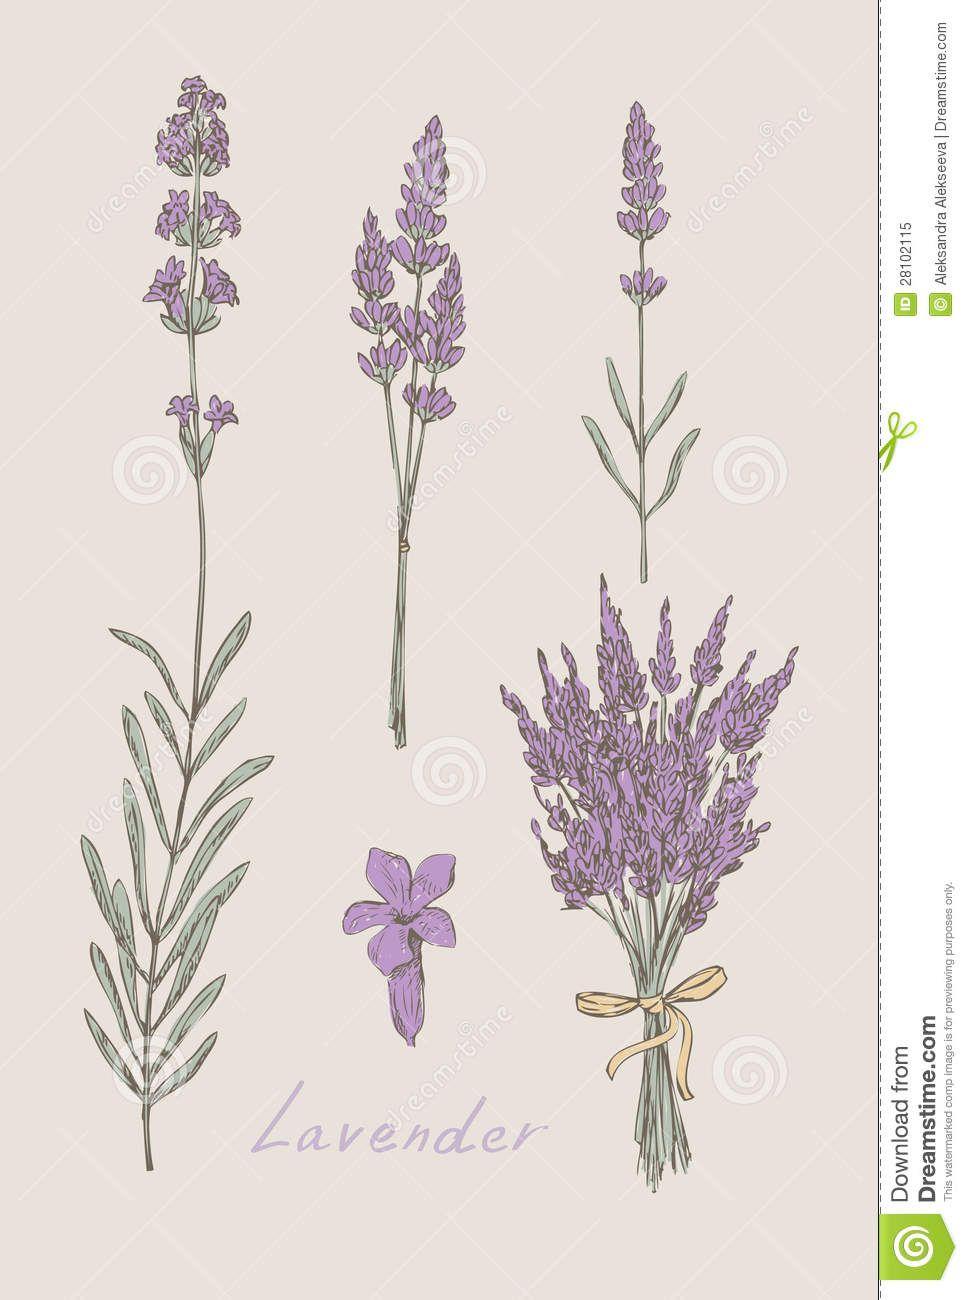 Botanical Flower Line Drawing : Lavender botanical drawing google search musings